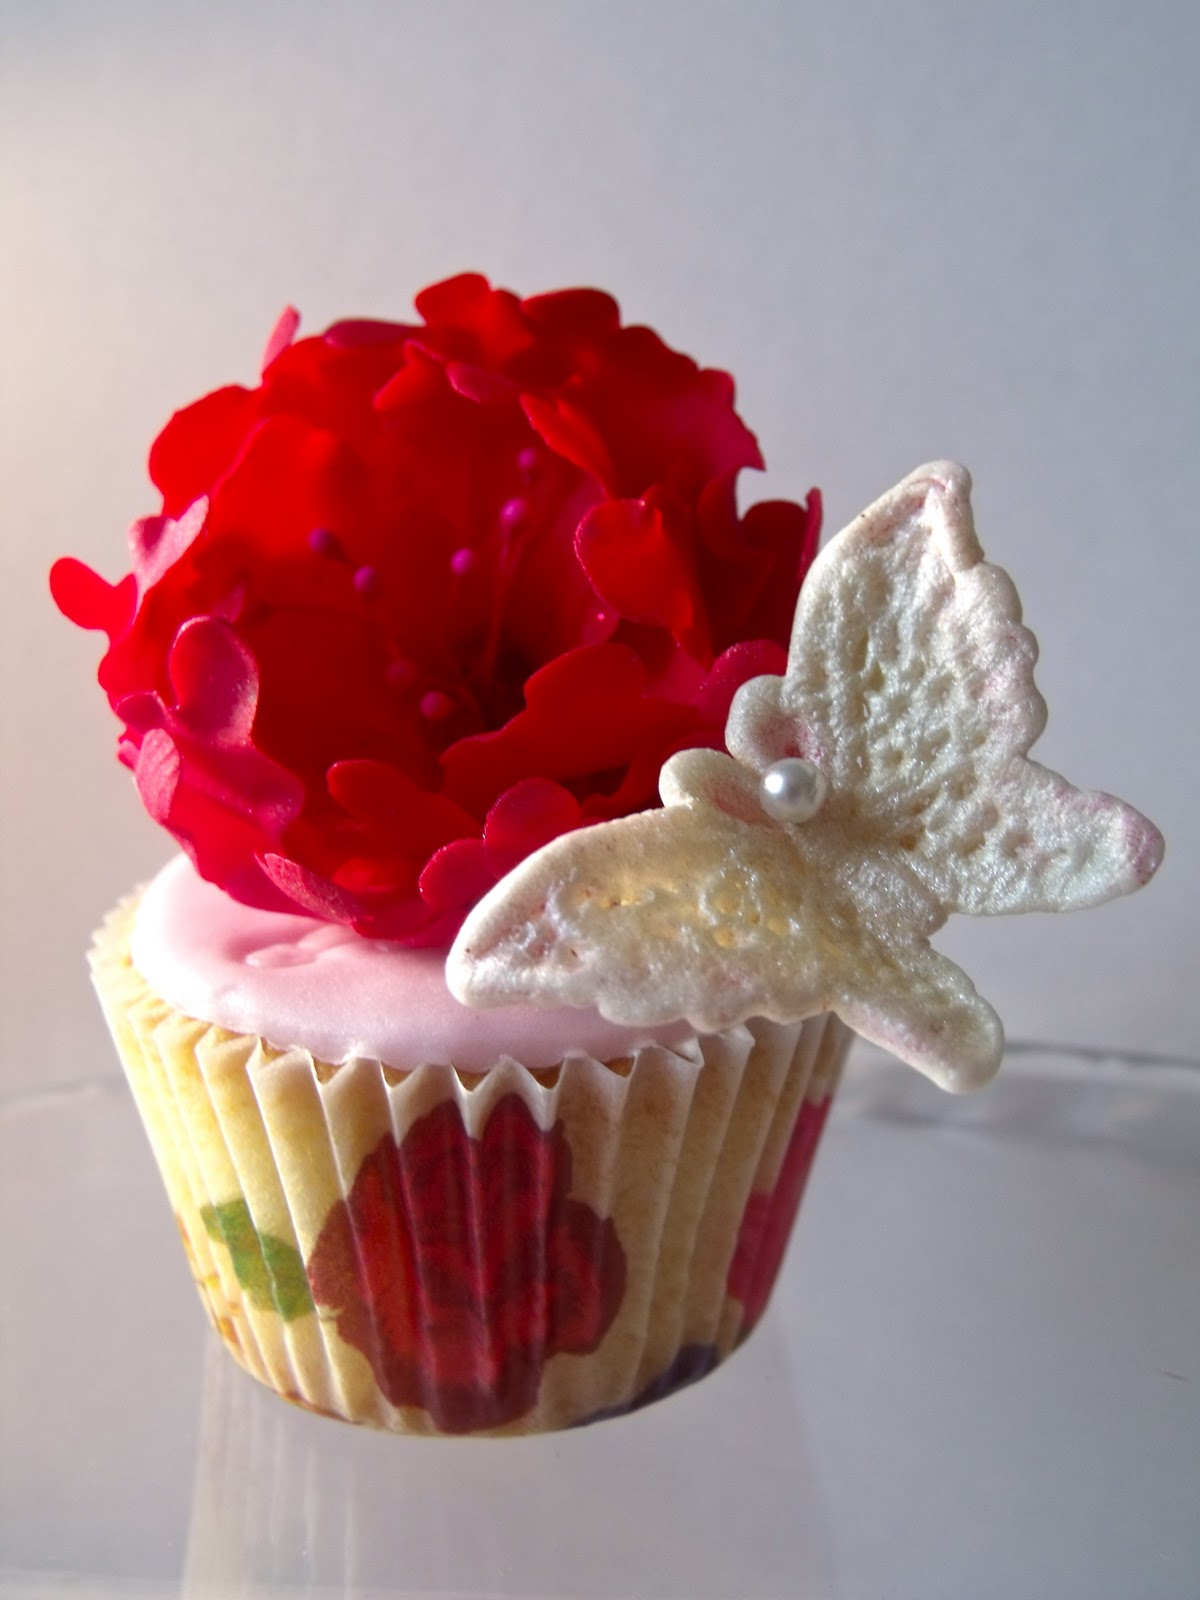 february cupcakes wallpaper - photo #2